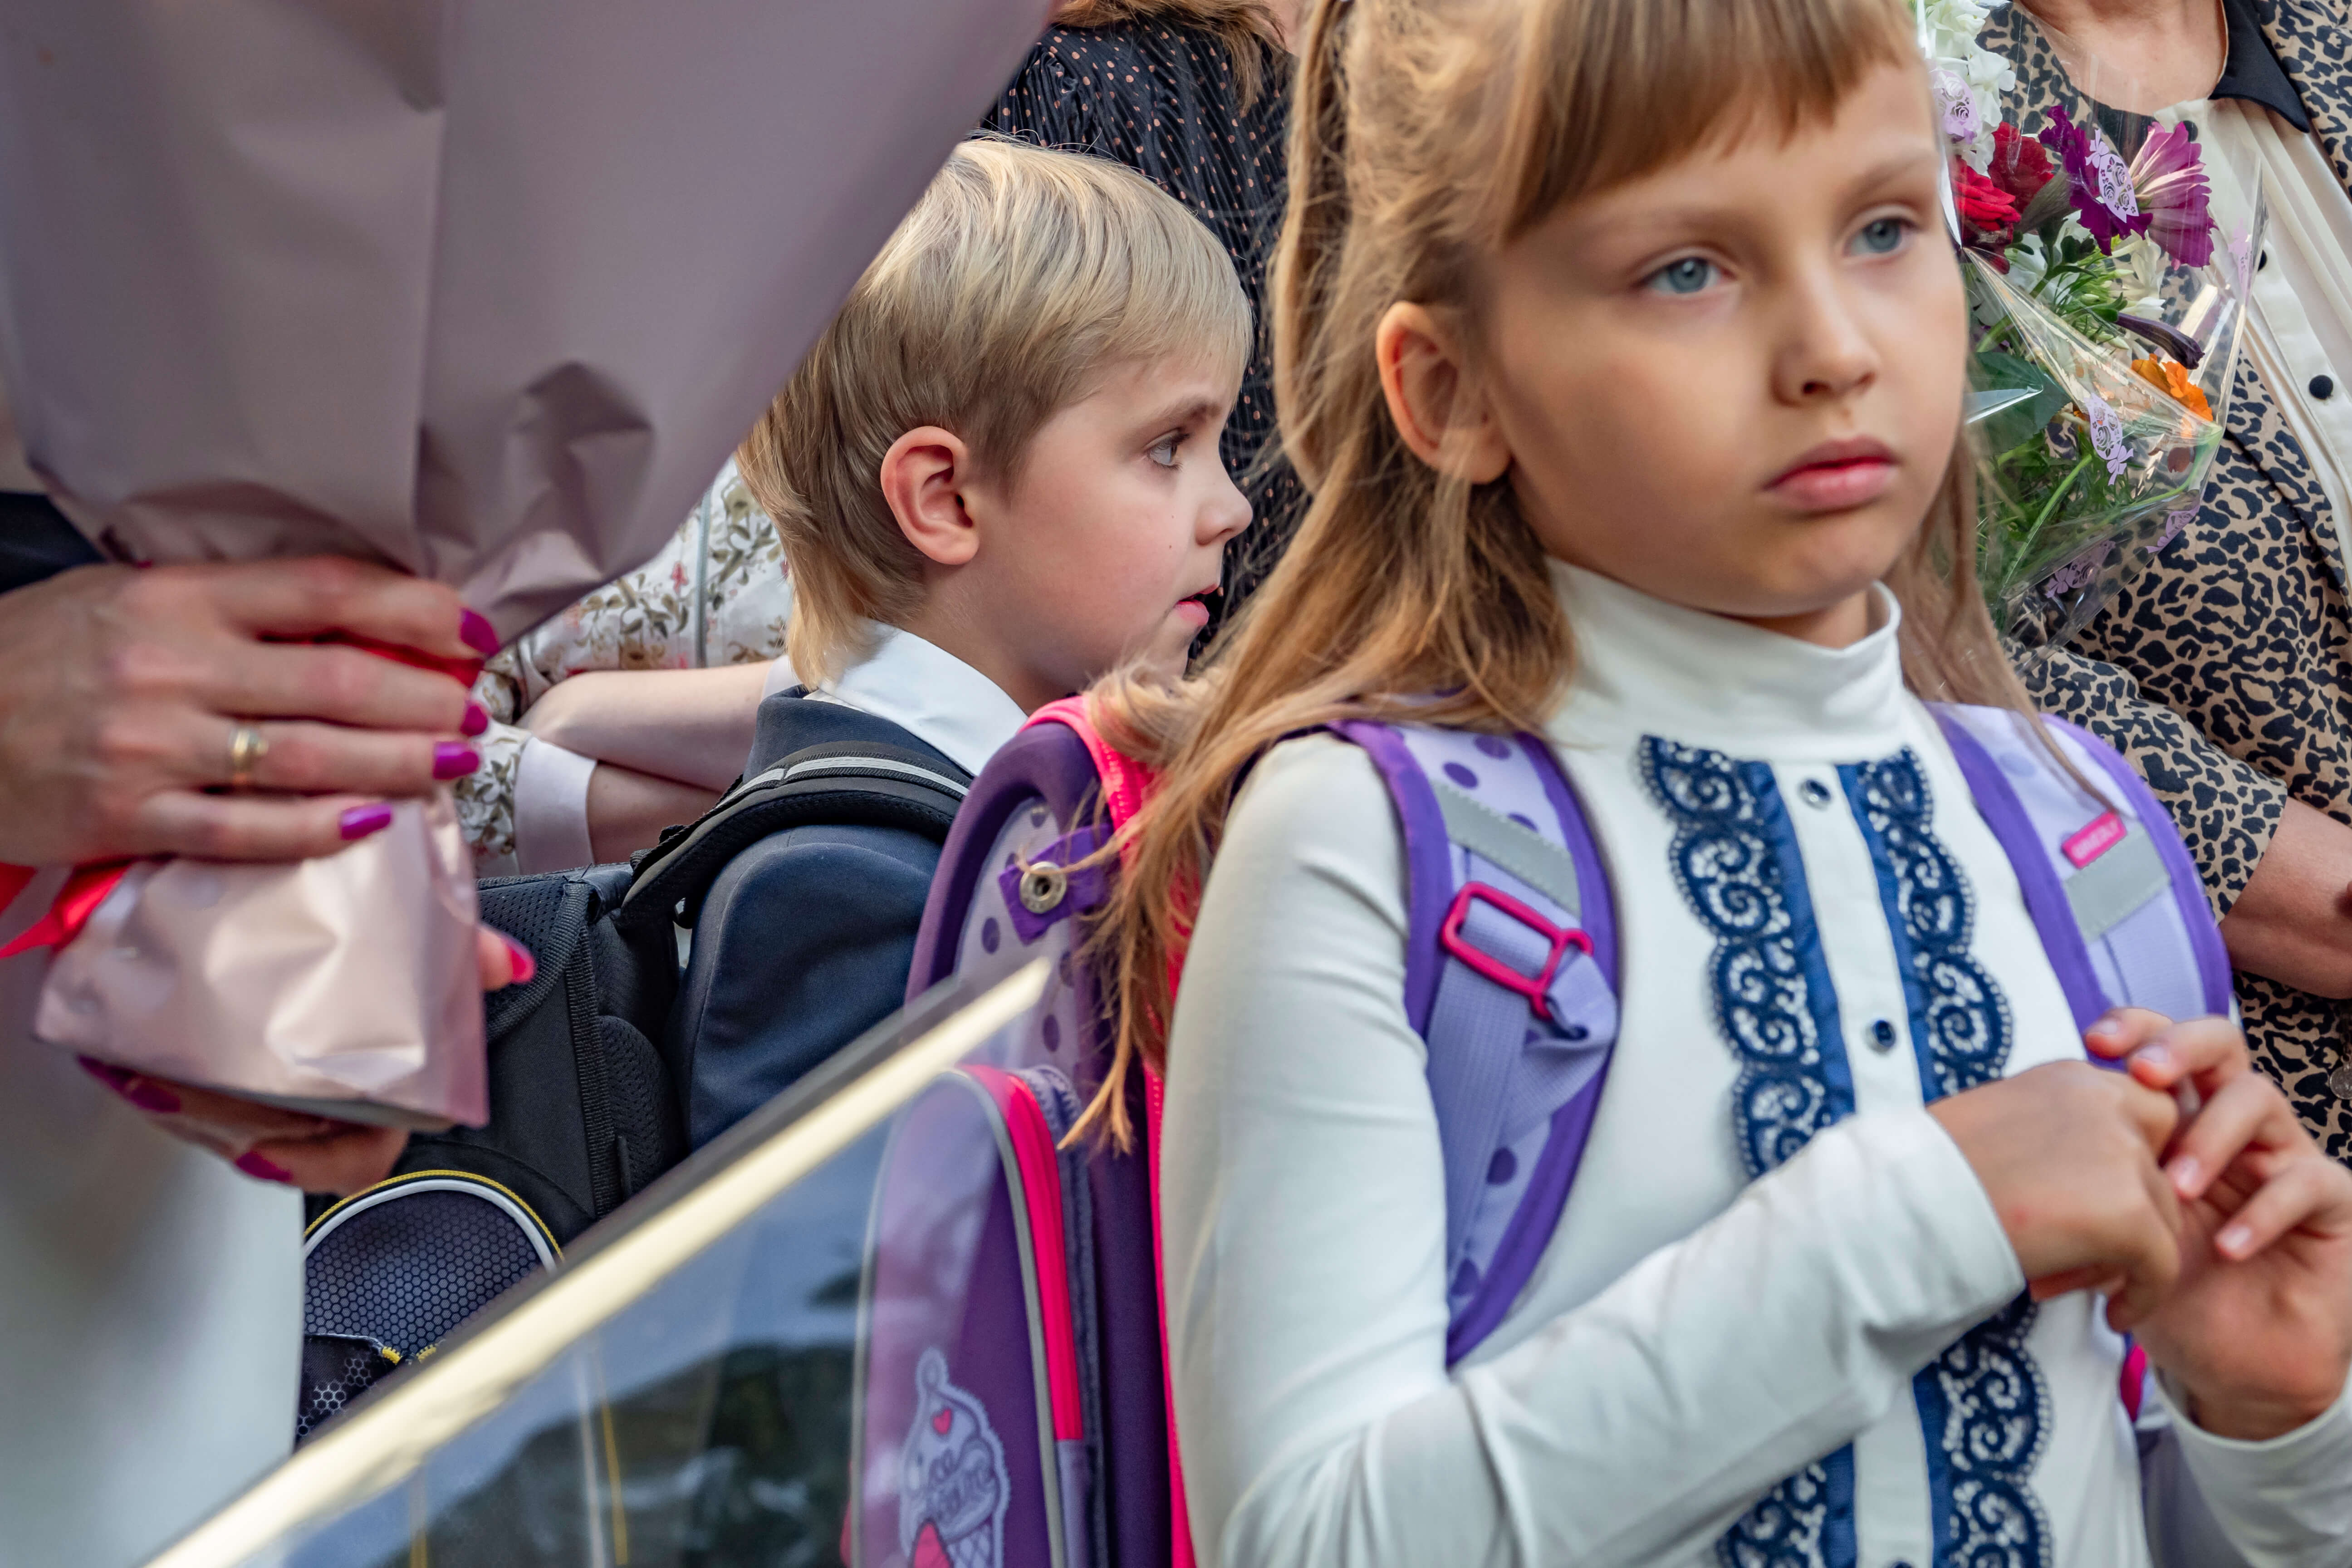 Konstantin Kokoshkin / Global Look Press